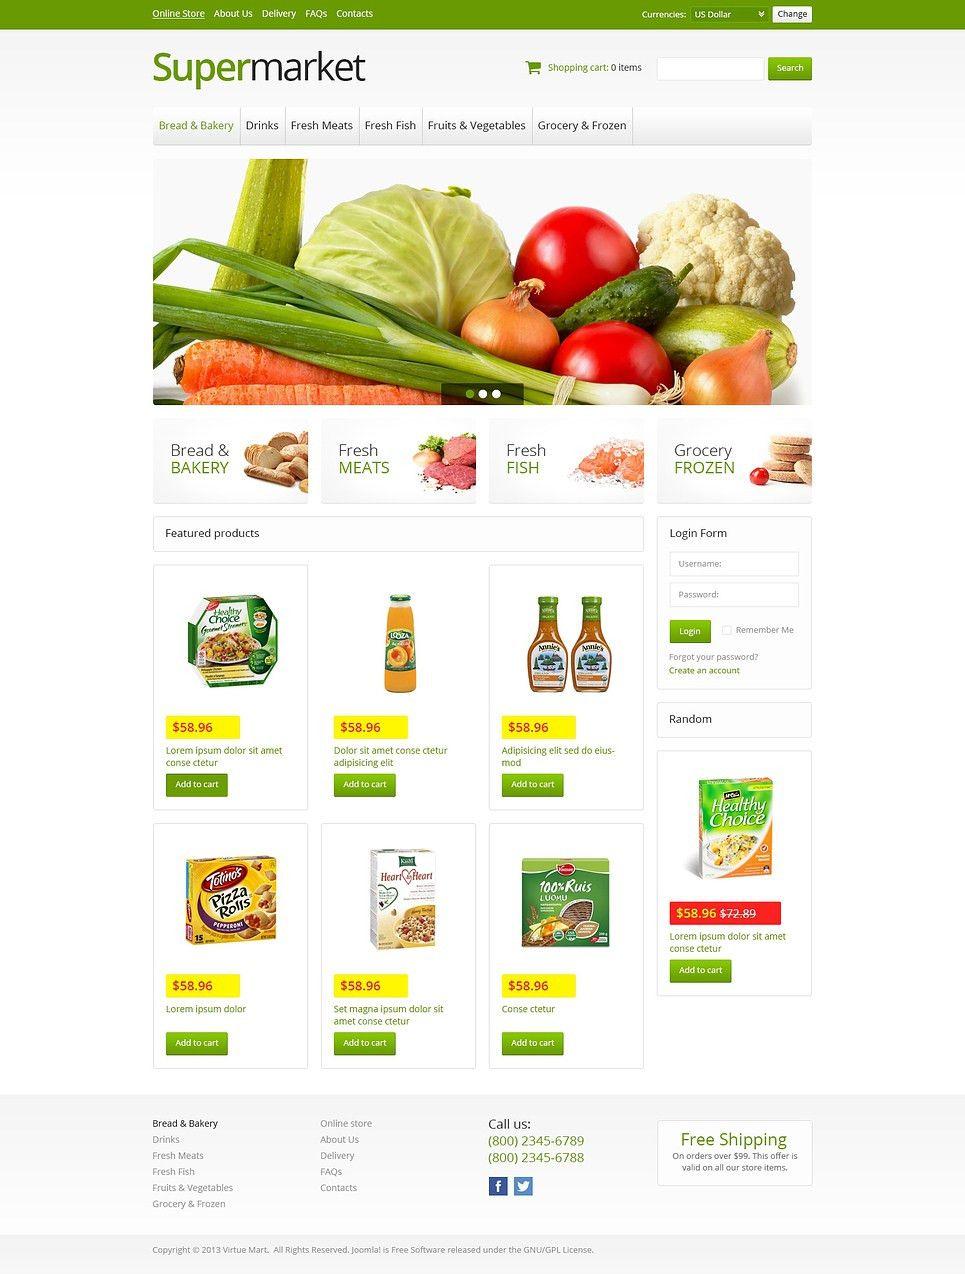 Online Supermarket VirtueMart Template #45942